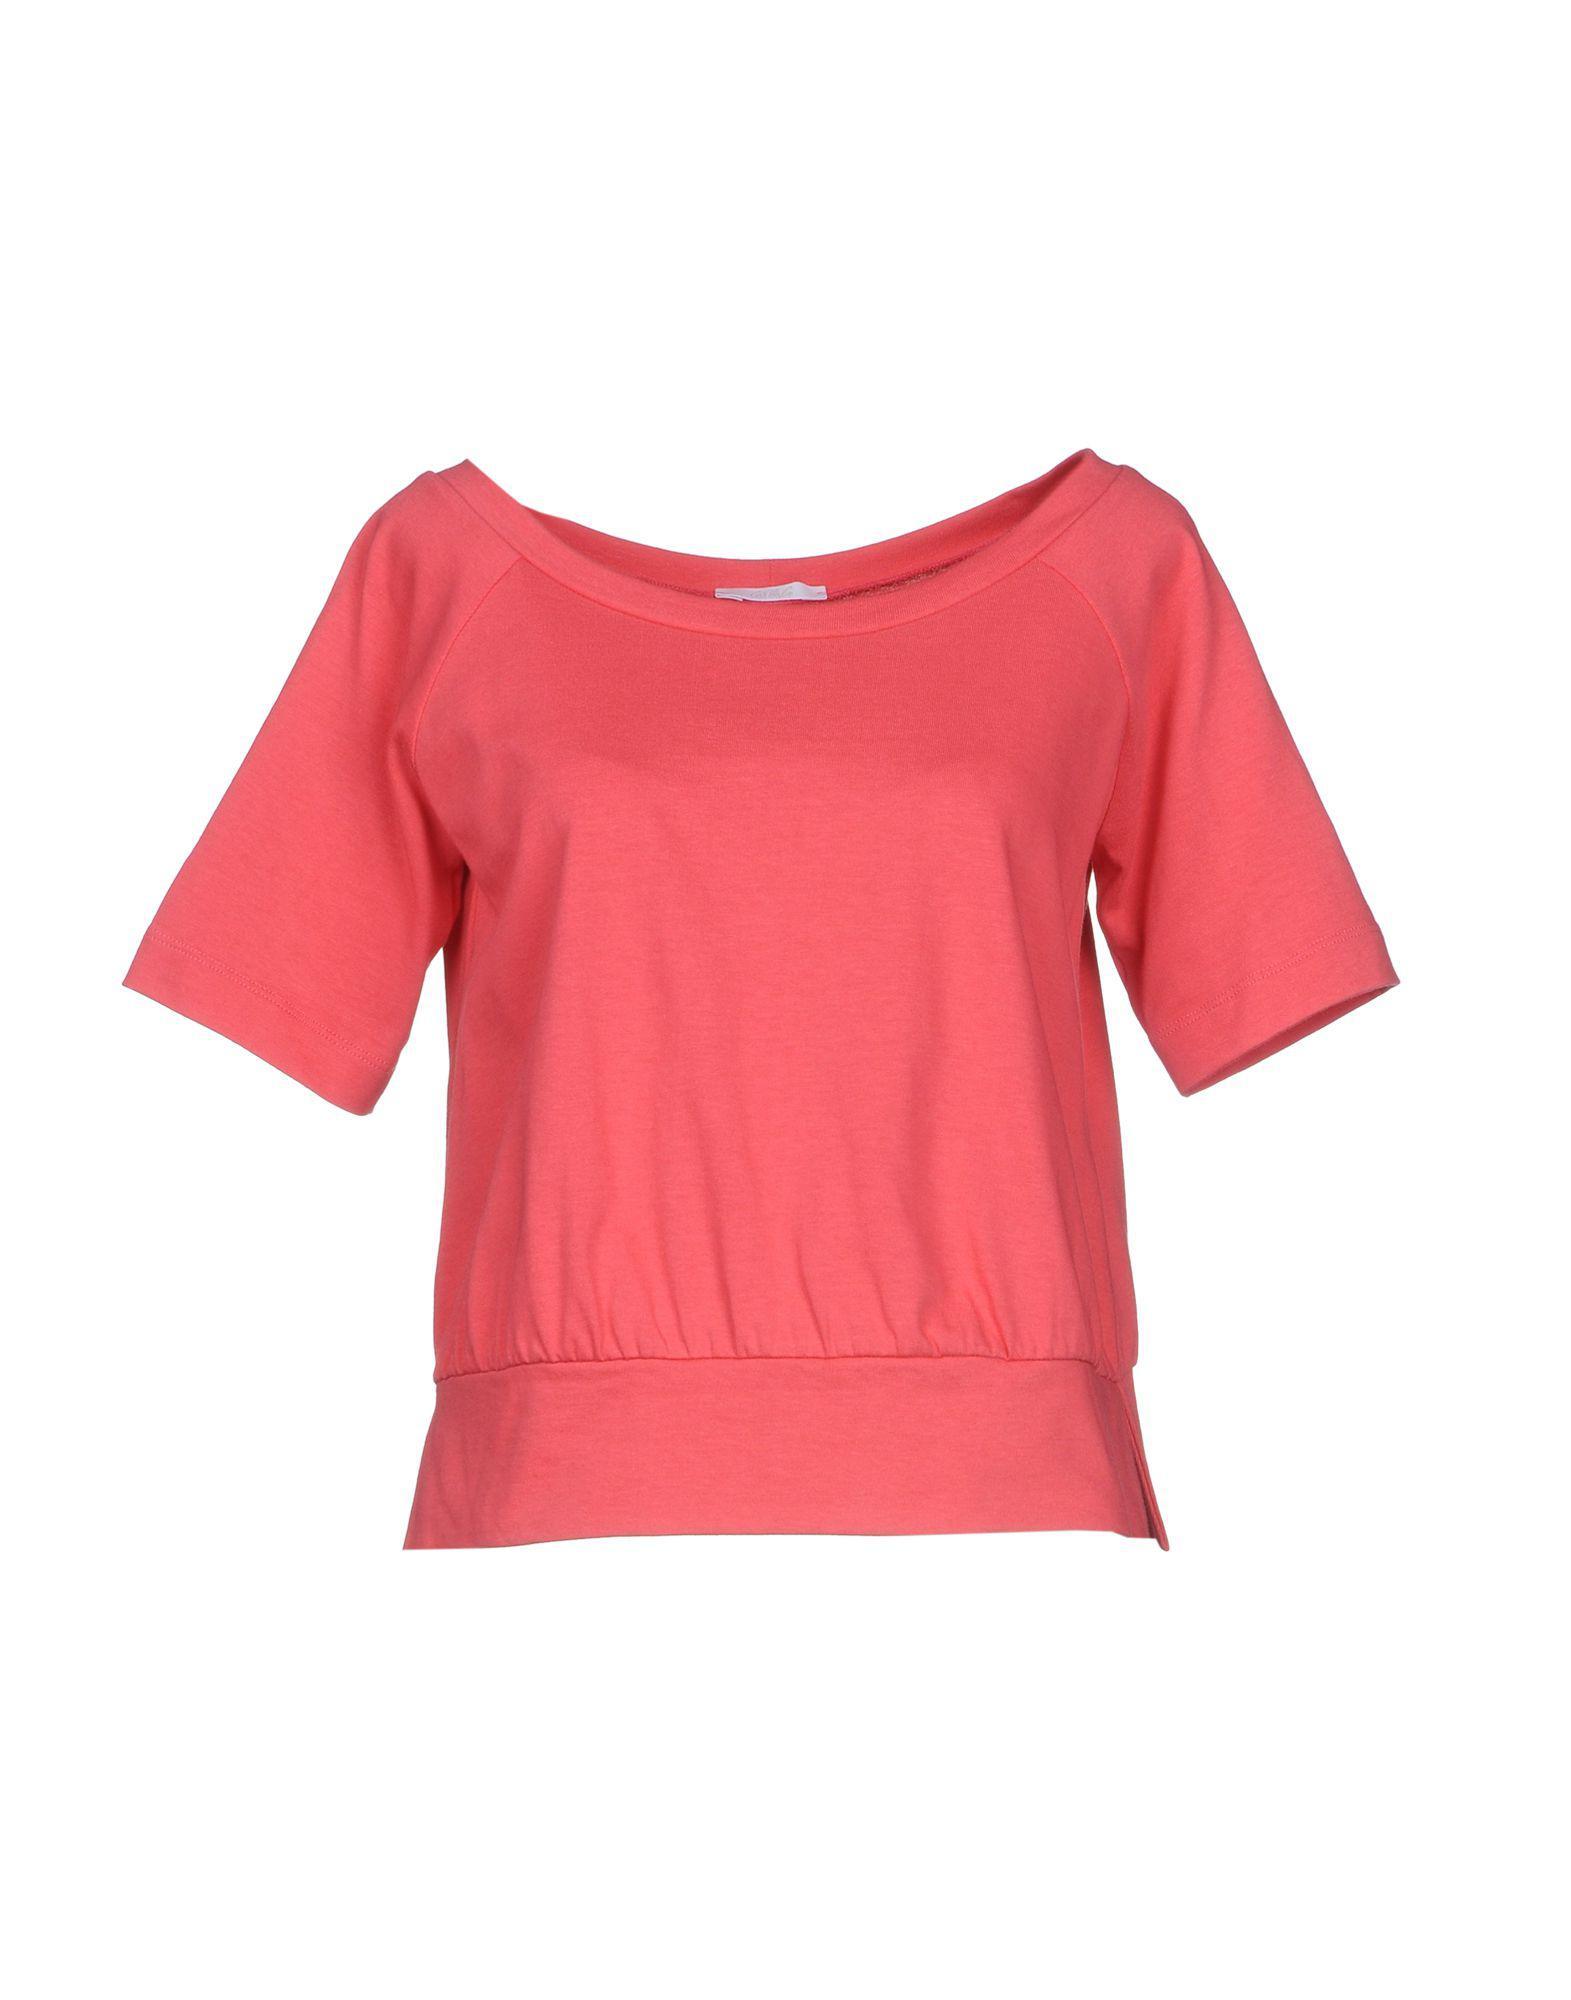 SHIRTS - Shirts Carla G. Sale Best Wholesale Outlet View Cheap Online Shop Cheap Sale Extremely Discount Wholesale Price KBbAzi1